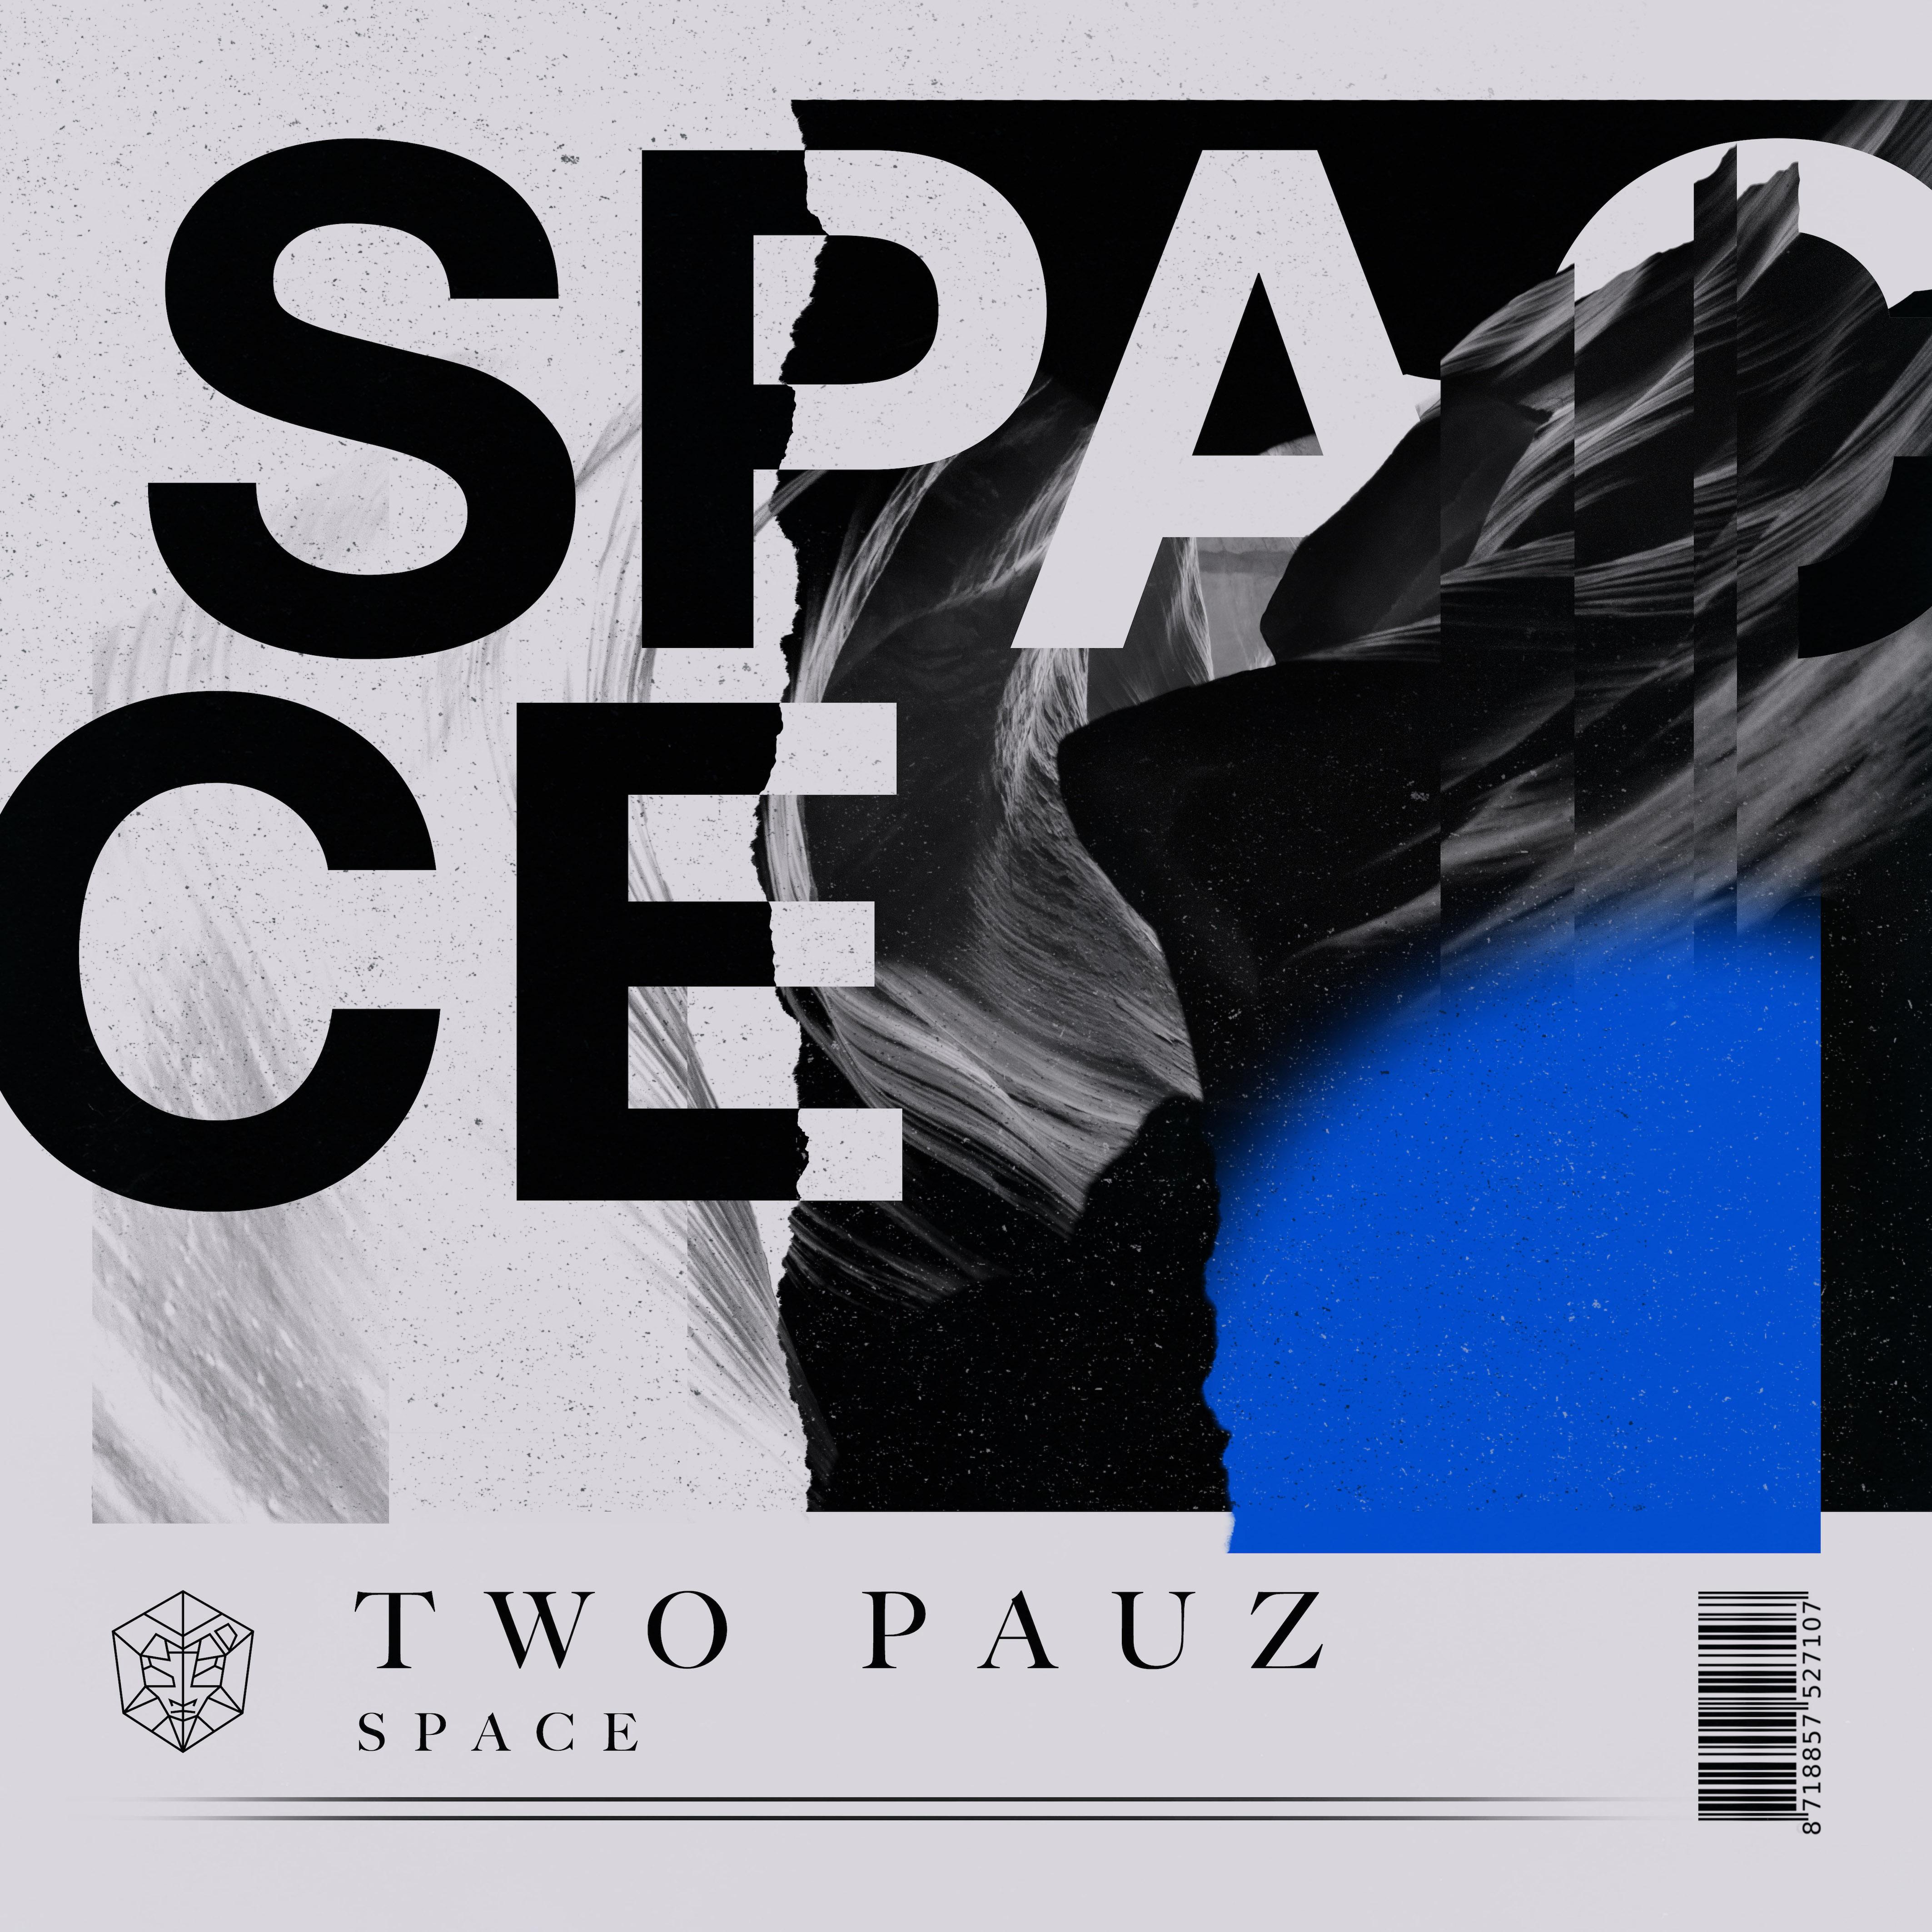 two_pauz_-_space_artwork_2.jpg